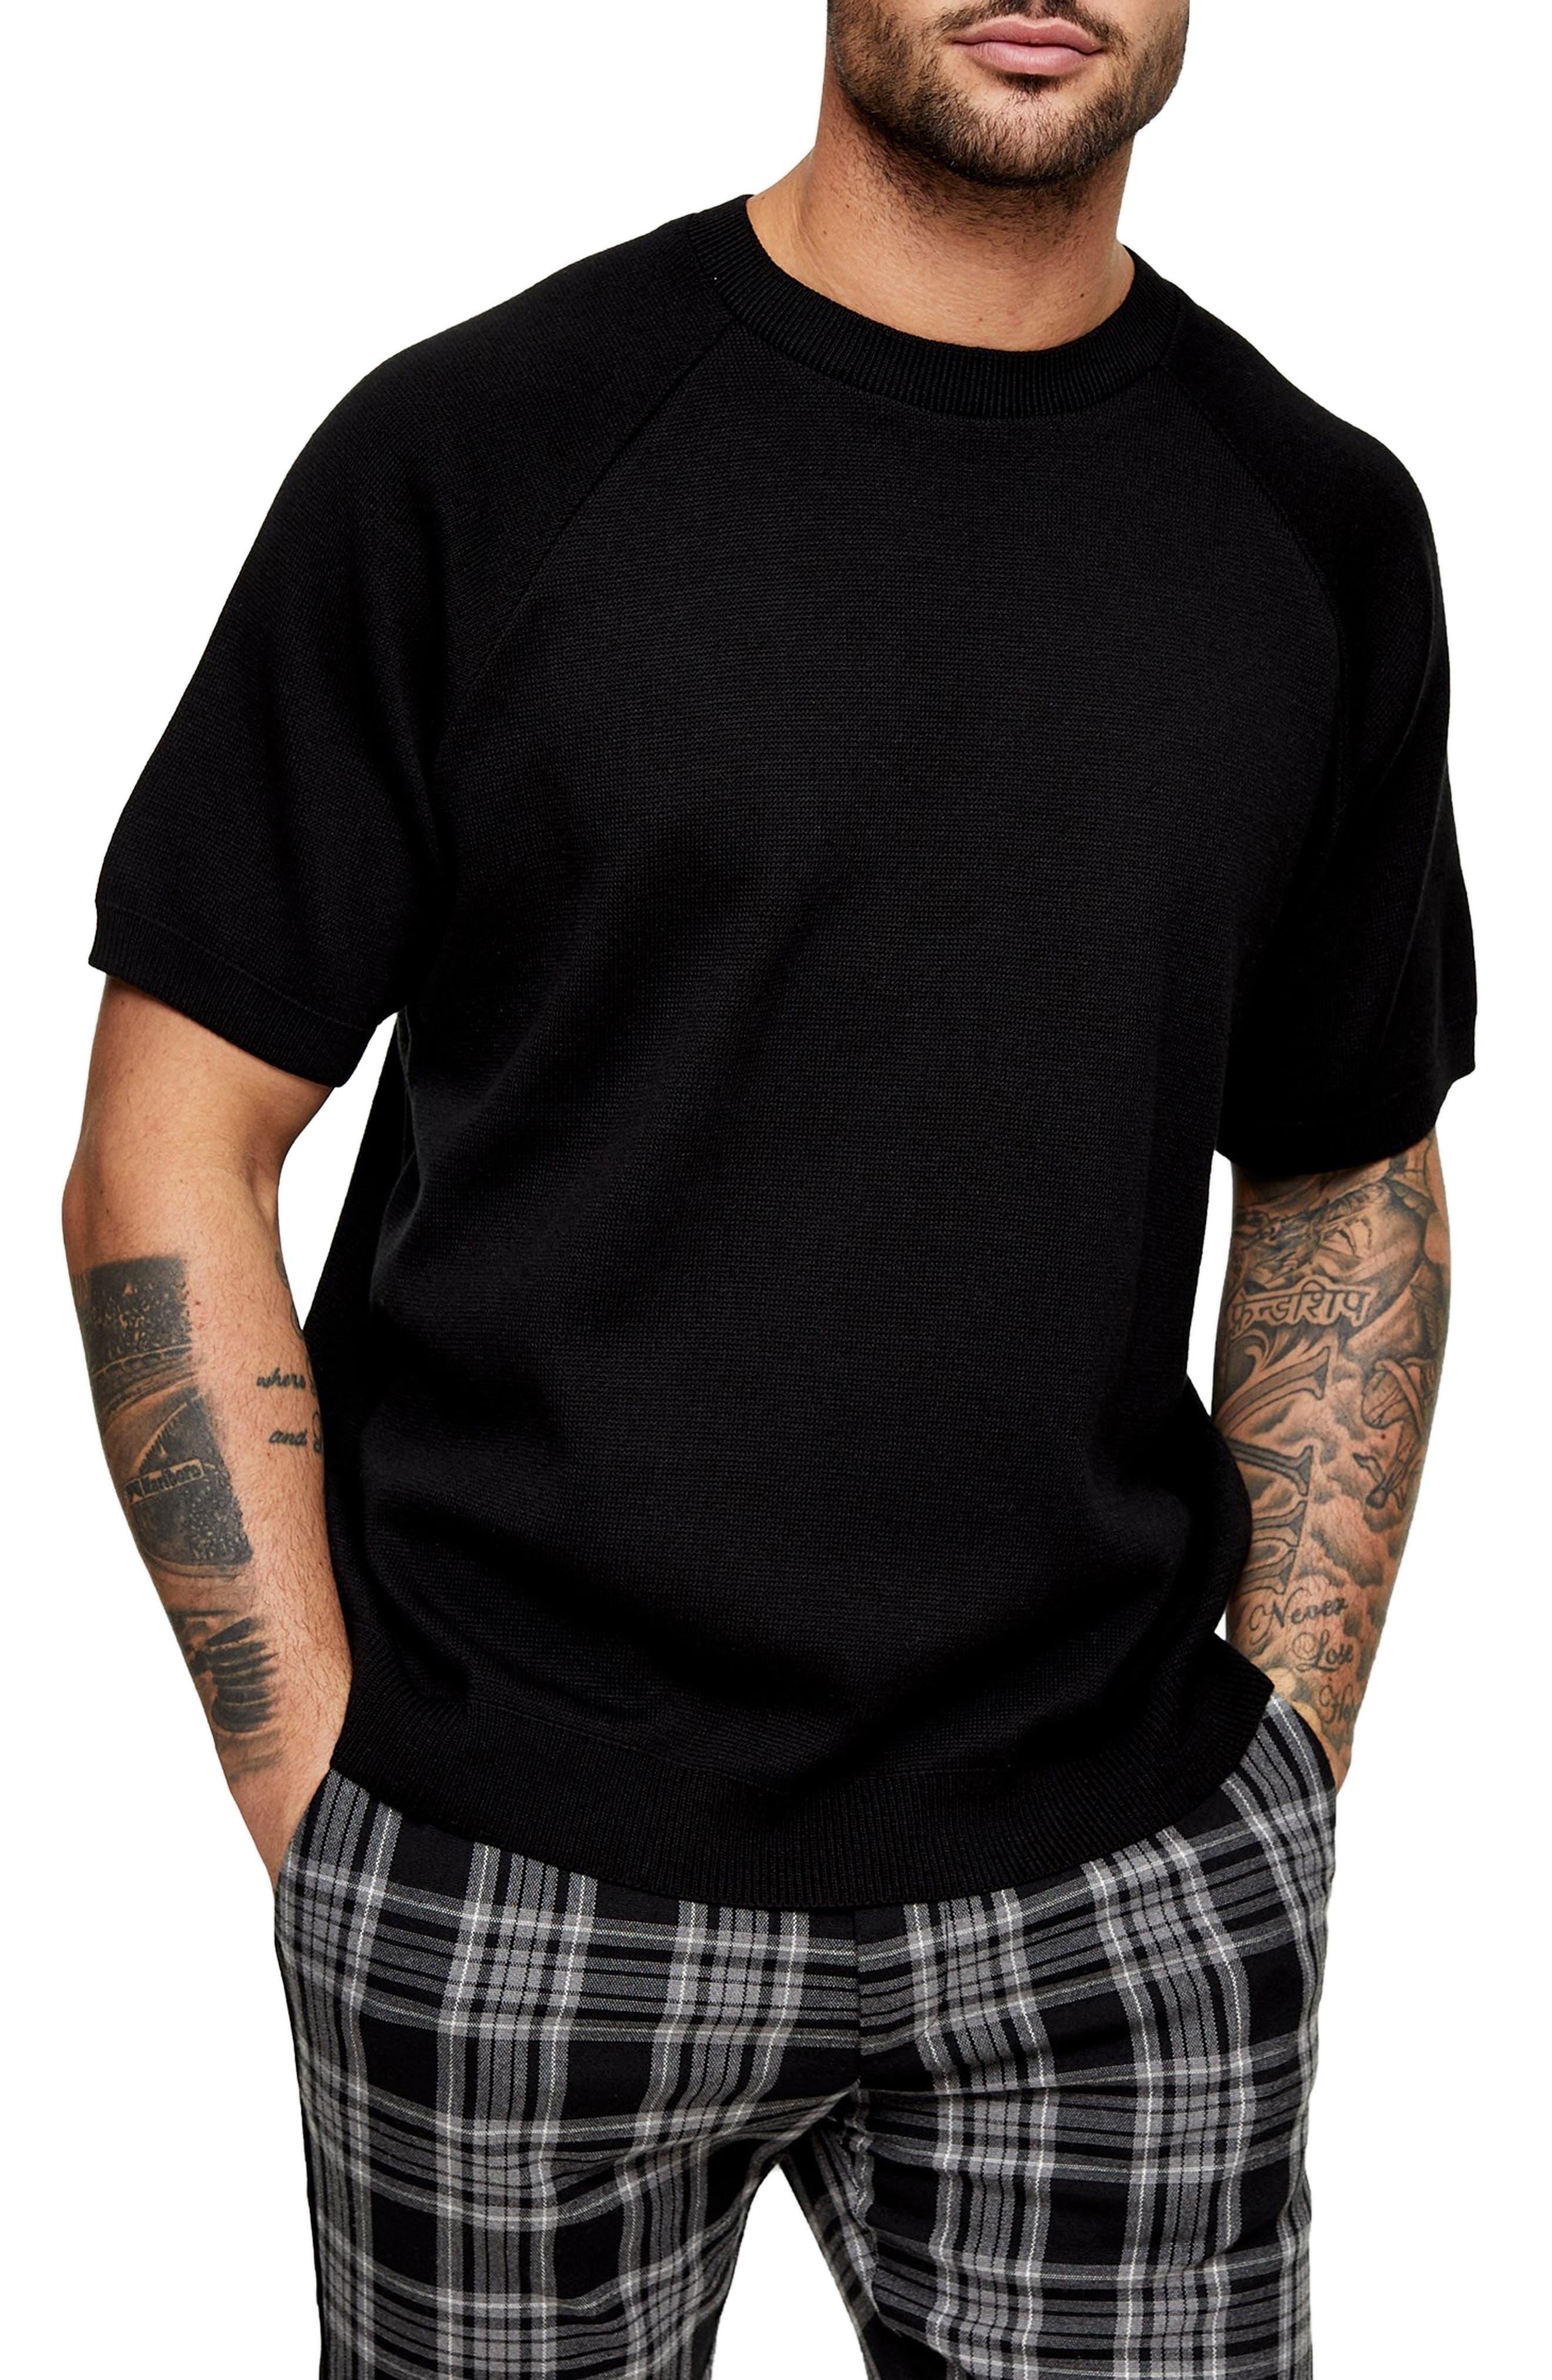 Mens Vintage Shirts – Retro Shirts Mens Topman Short Sleeve Crewneck Sweater $40.00 AT vintagedancer.com